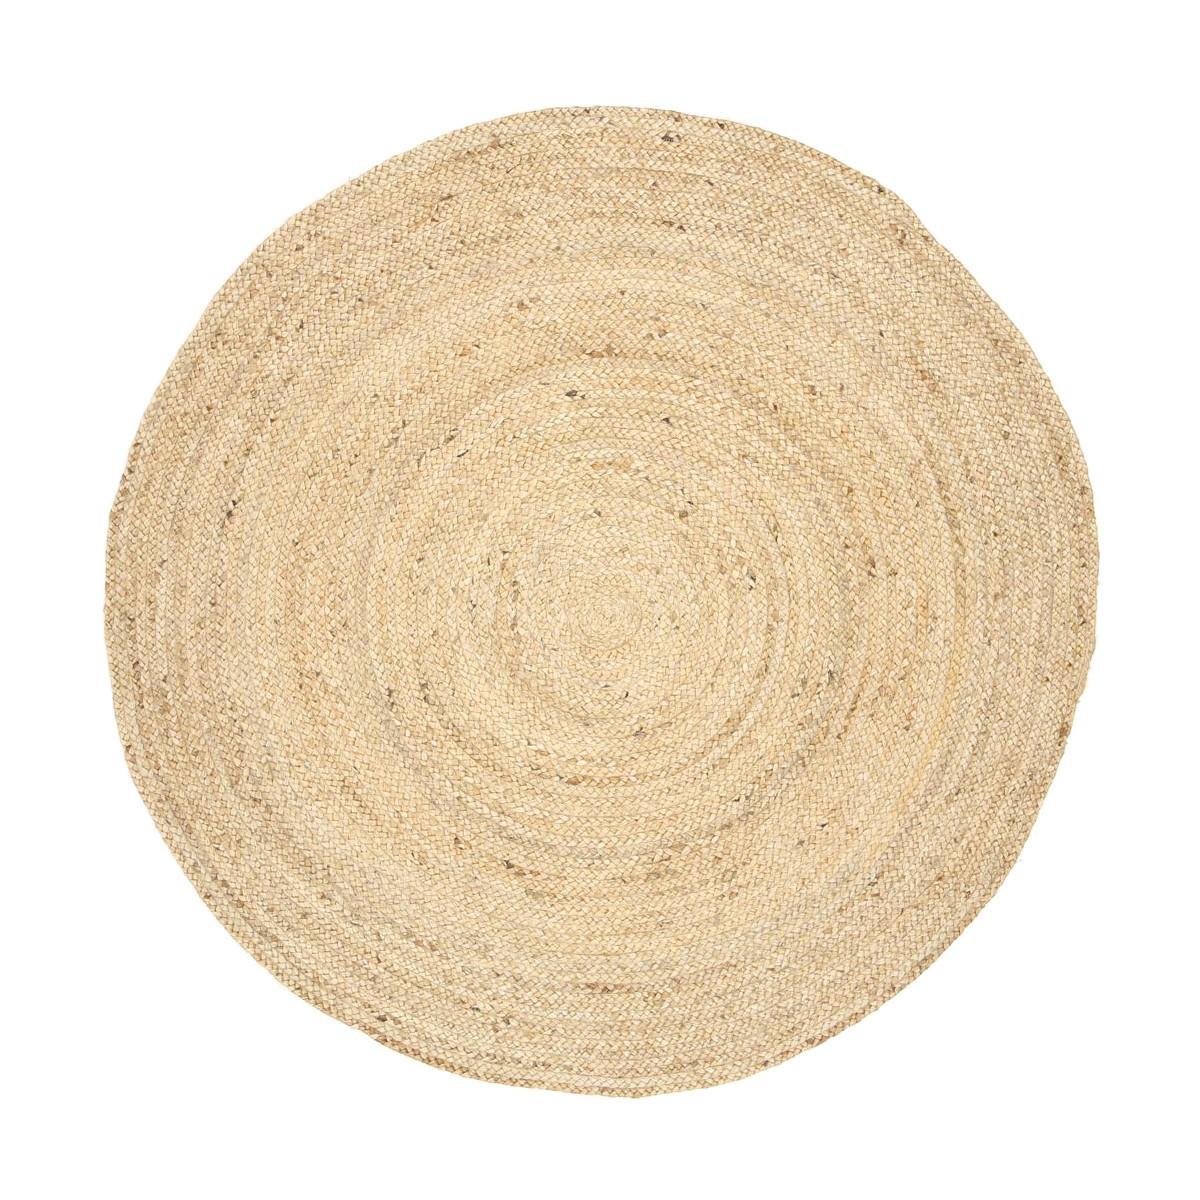 Organica Reversible Jute Round Rug, 200cm, Natrual